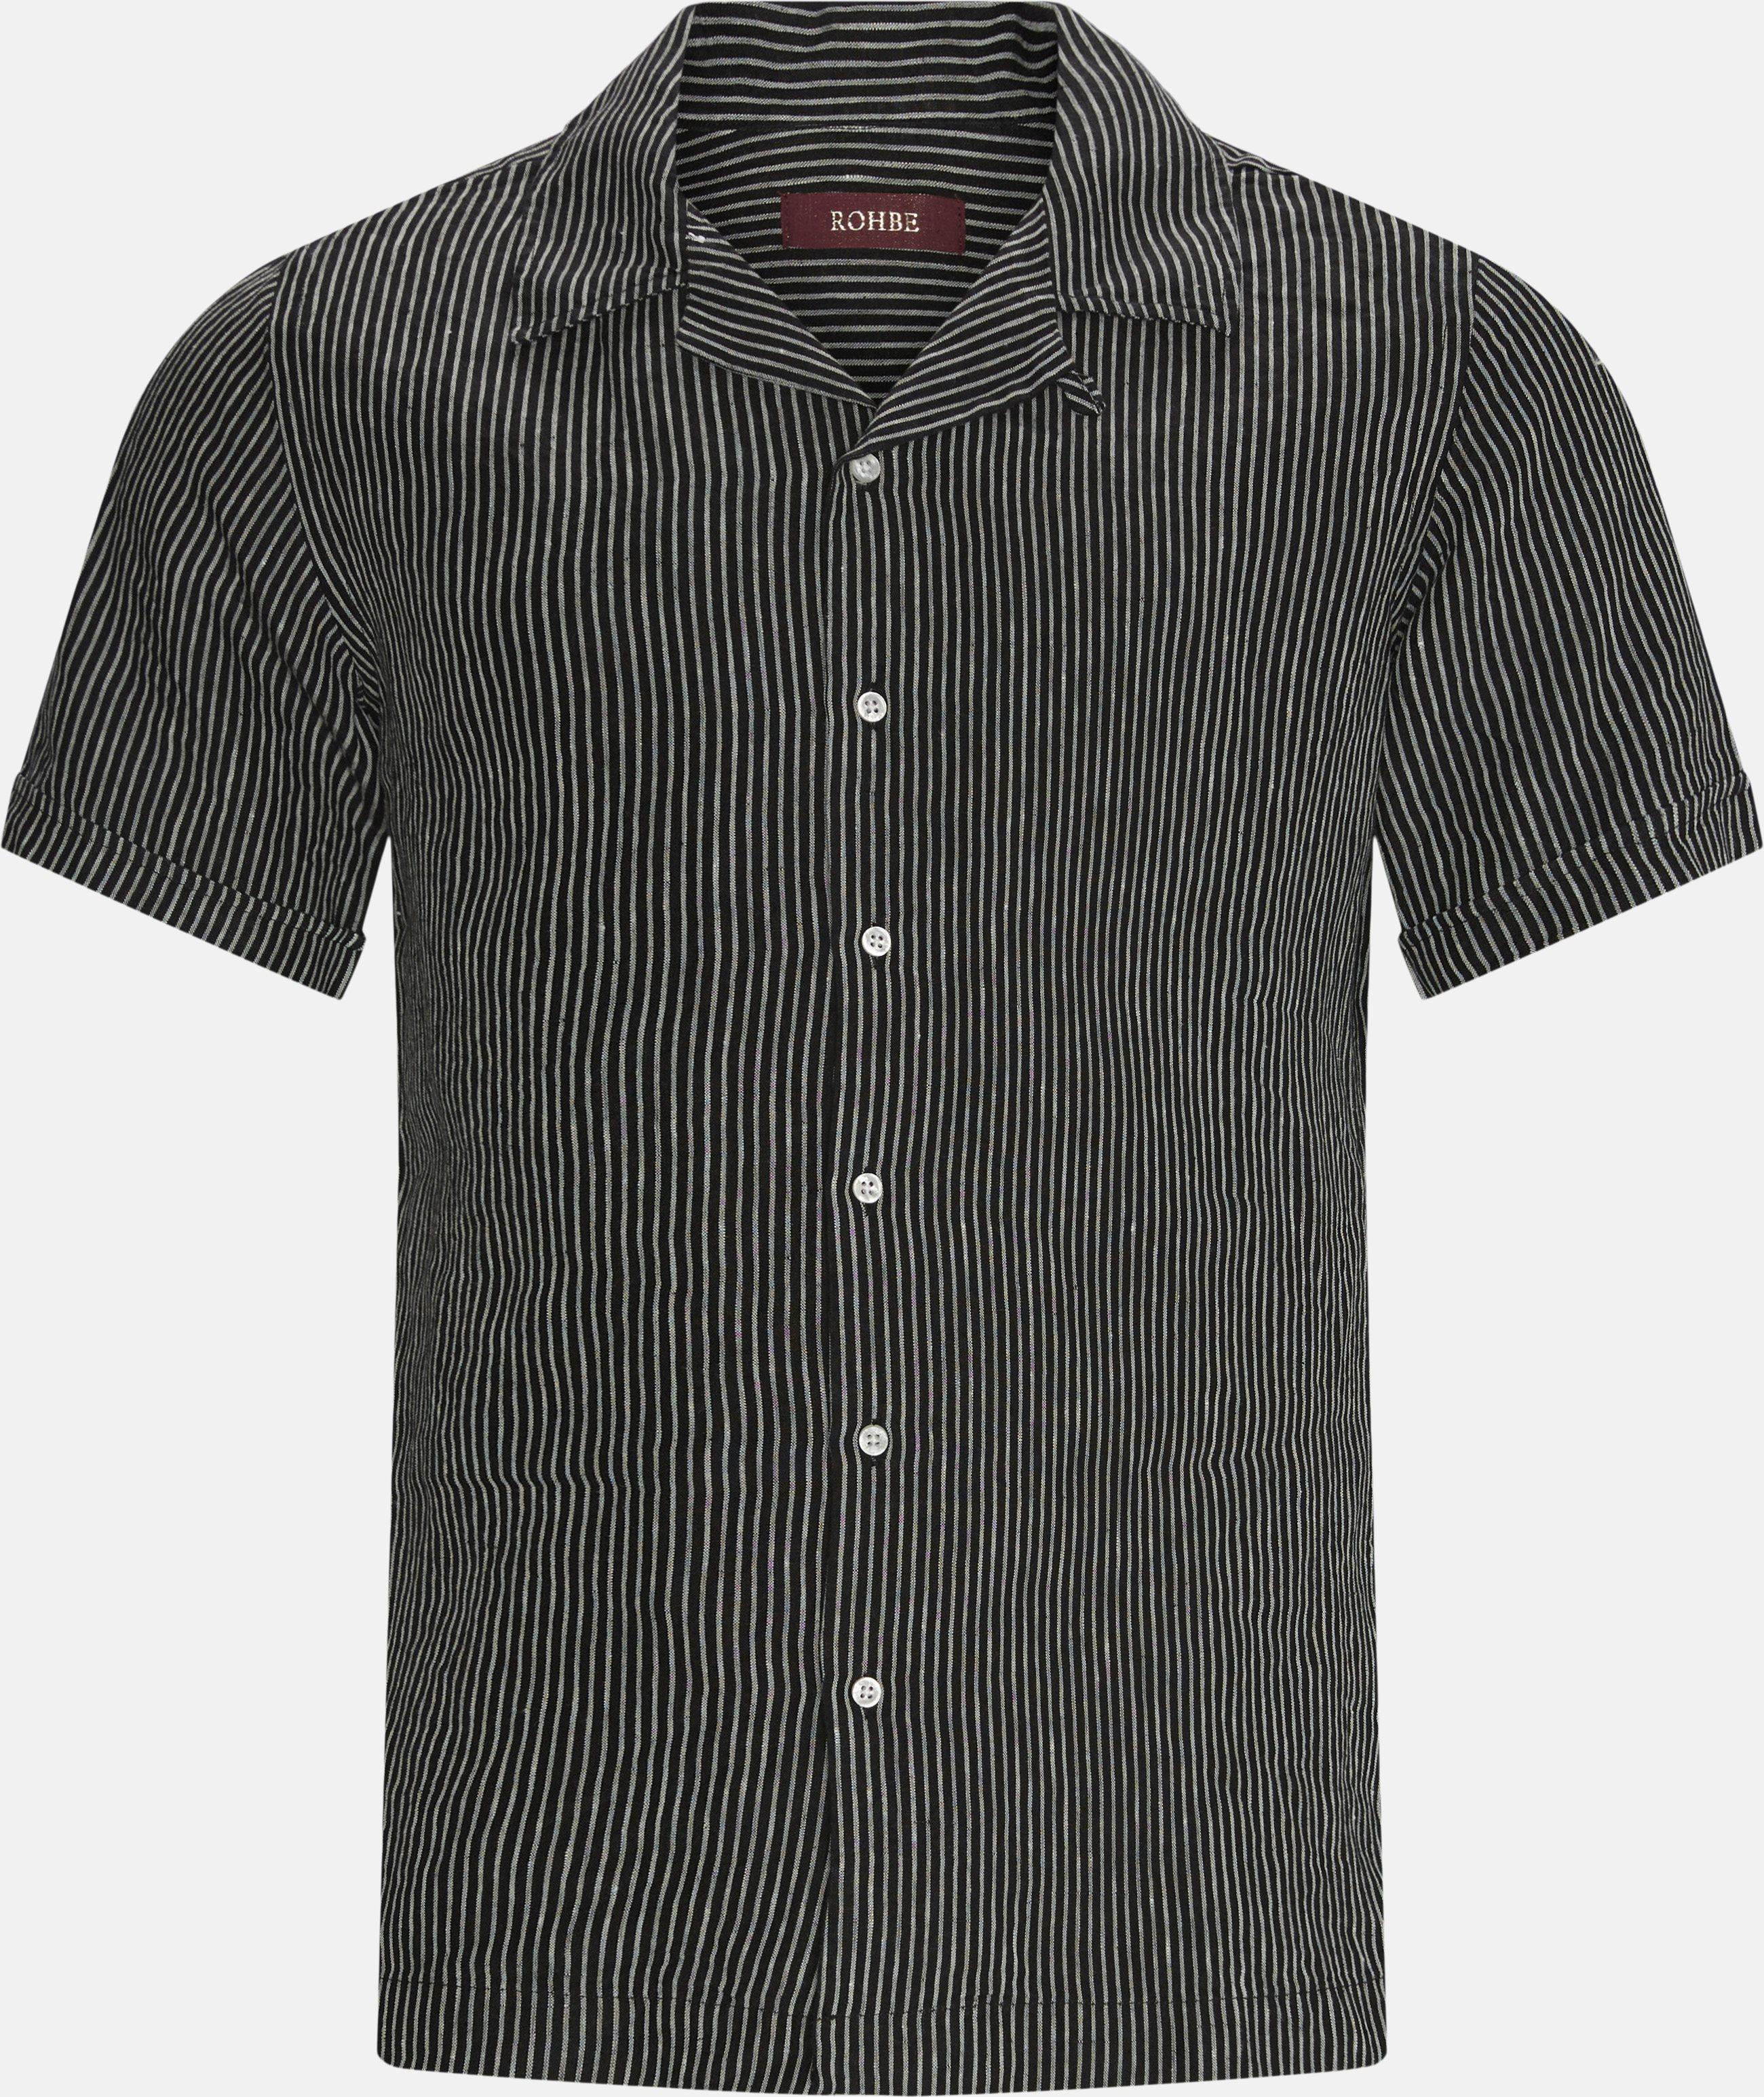 Hans SS Shirt - Kortærmede skjorter - Regular - Sort